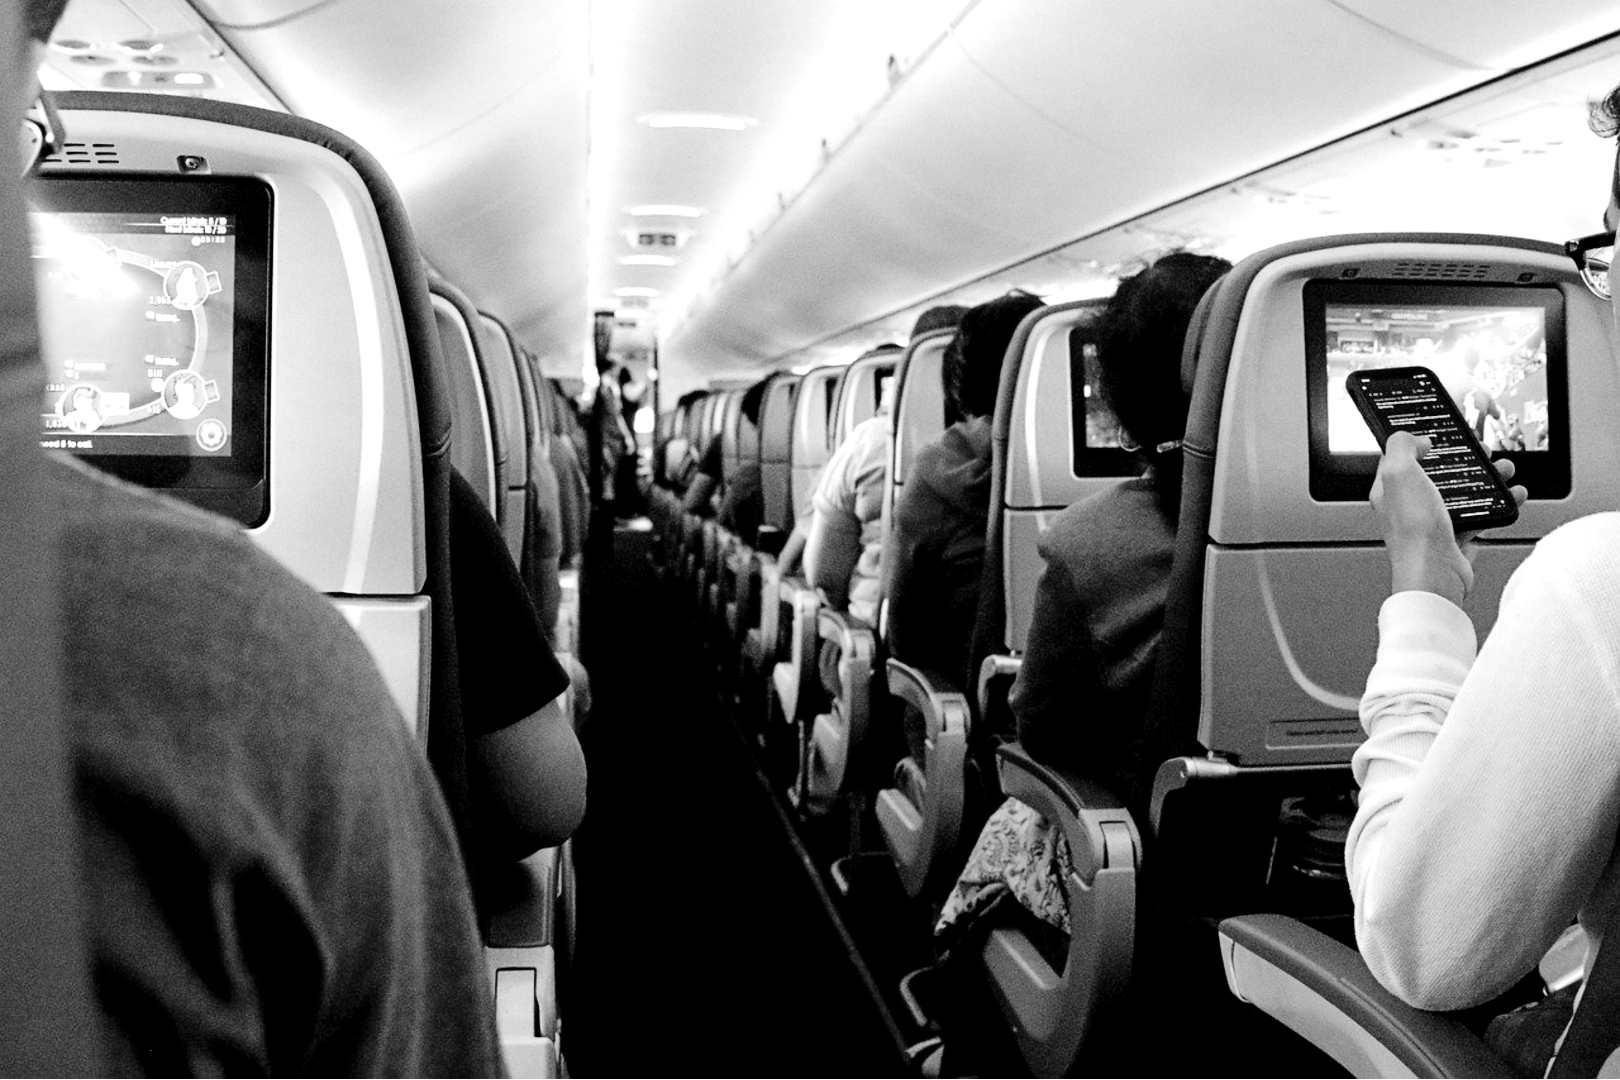 Samolot - pasażerka zmarła